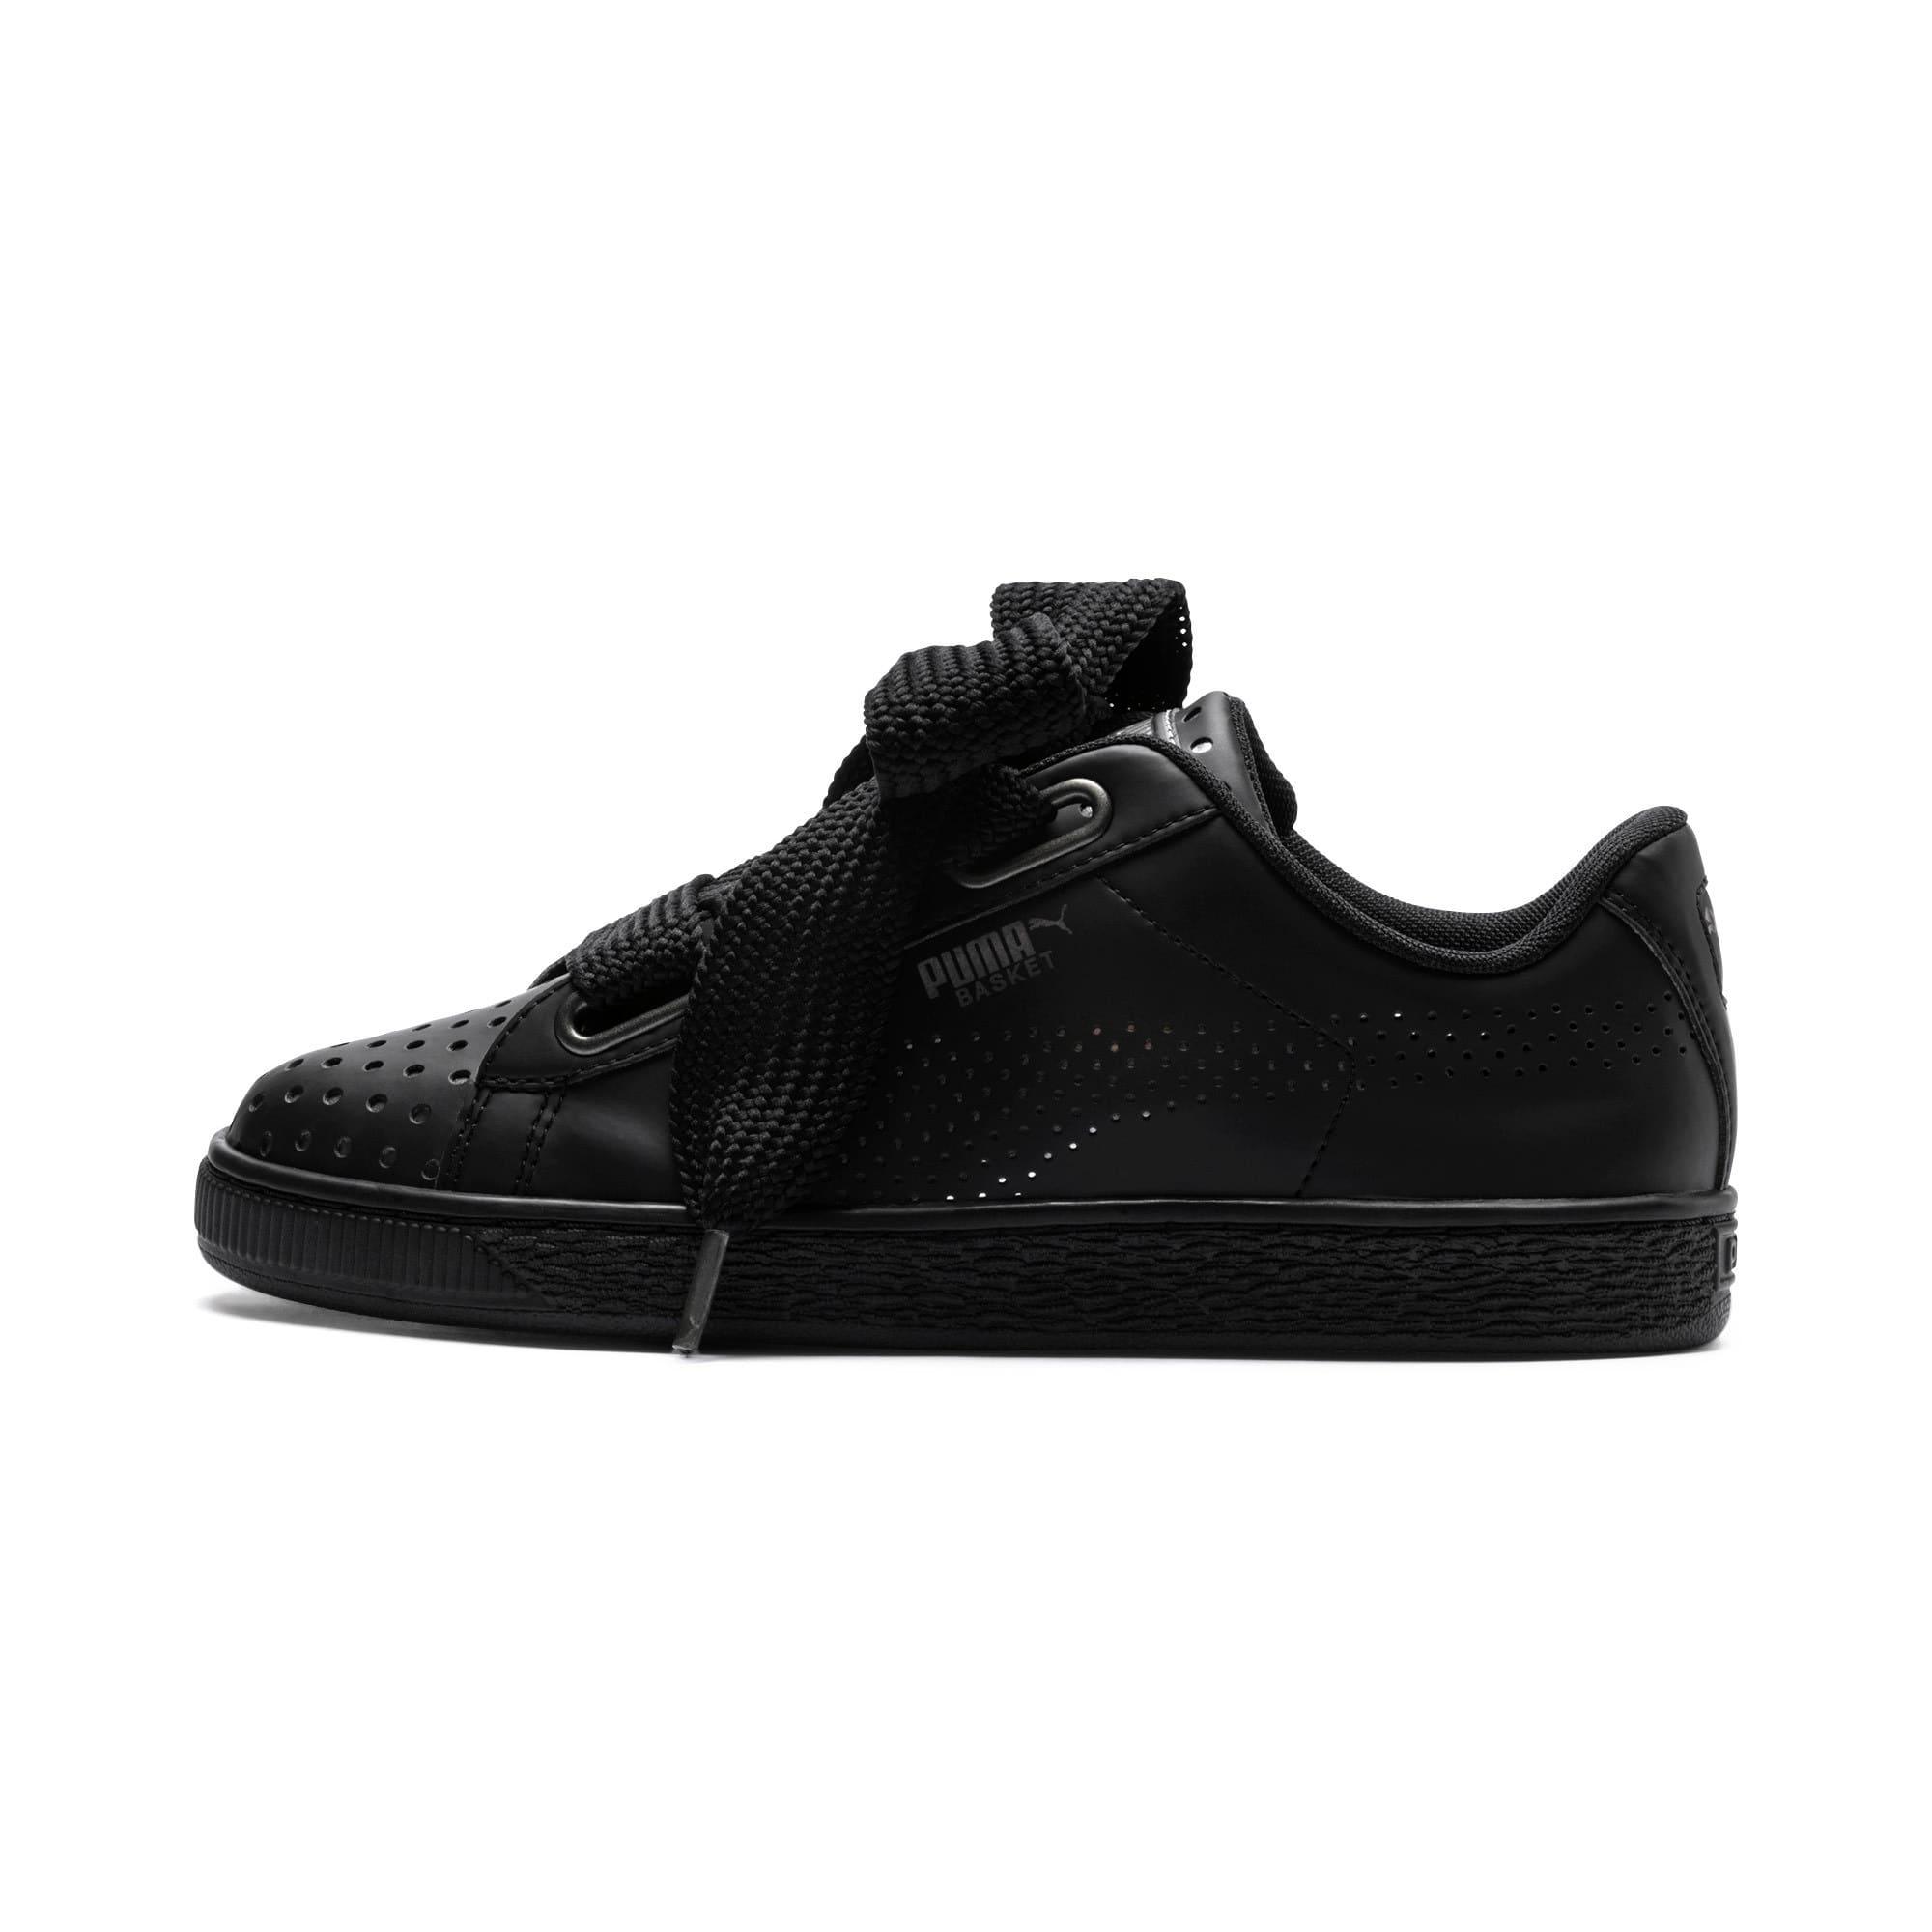 Thumbnail 1 of Basket Heart Lux Women's Sneakers, Puma Black-Puma Black, medium